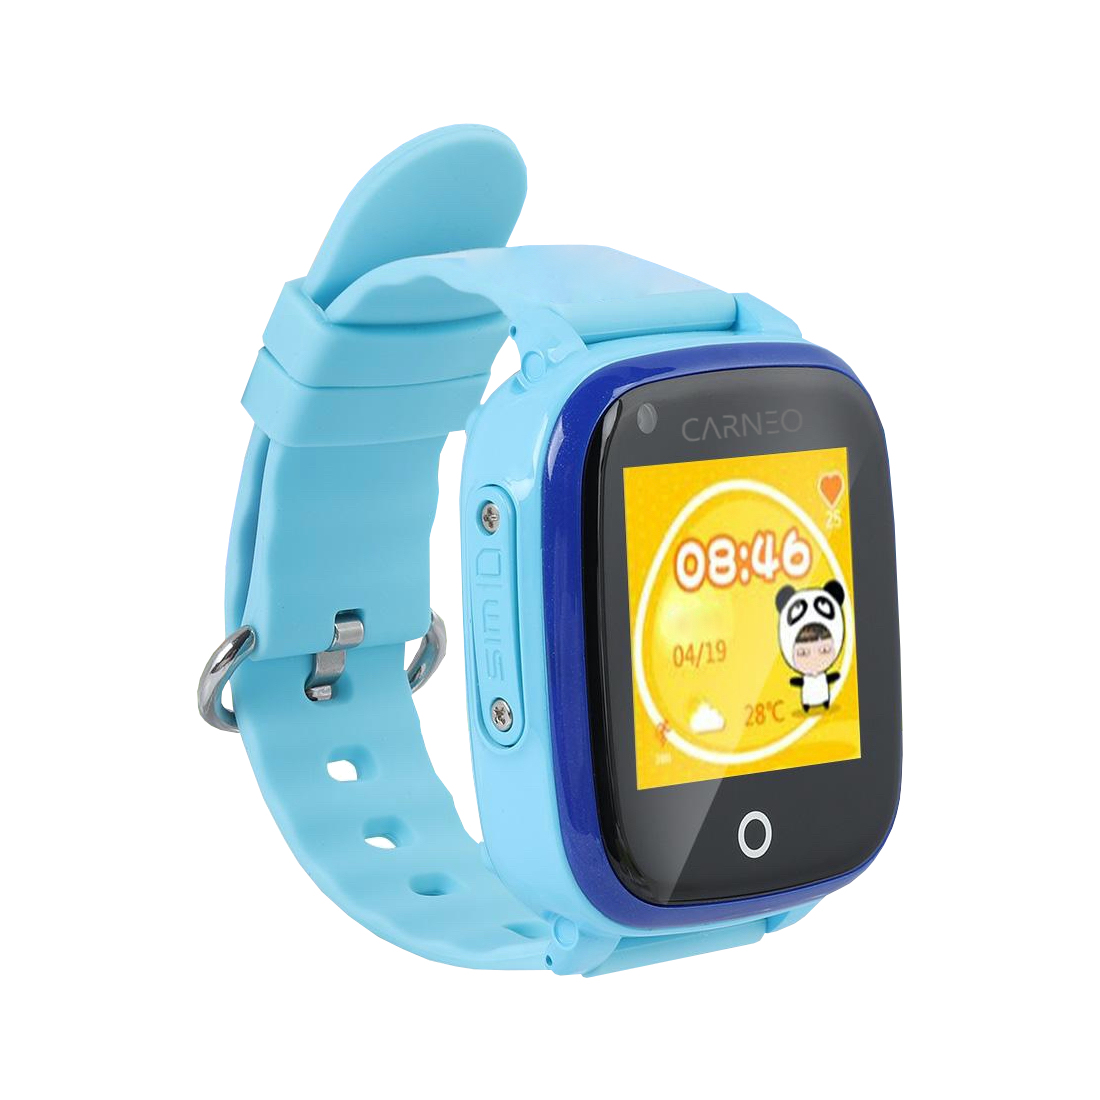 CARNEO GuardKid+ 4G blue - 8588007861135